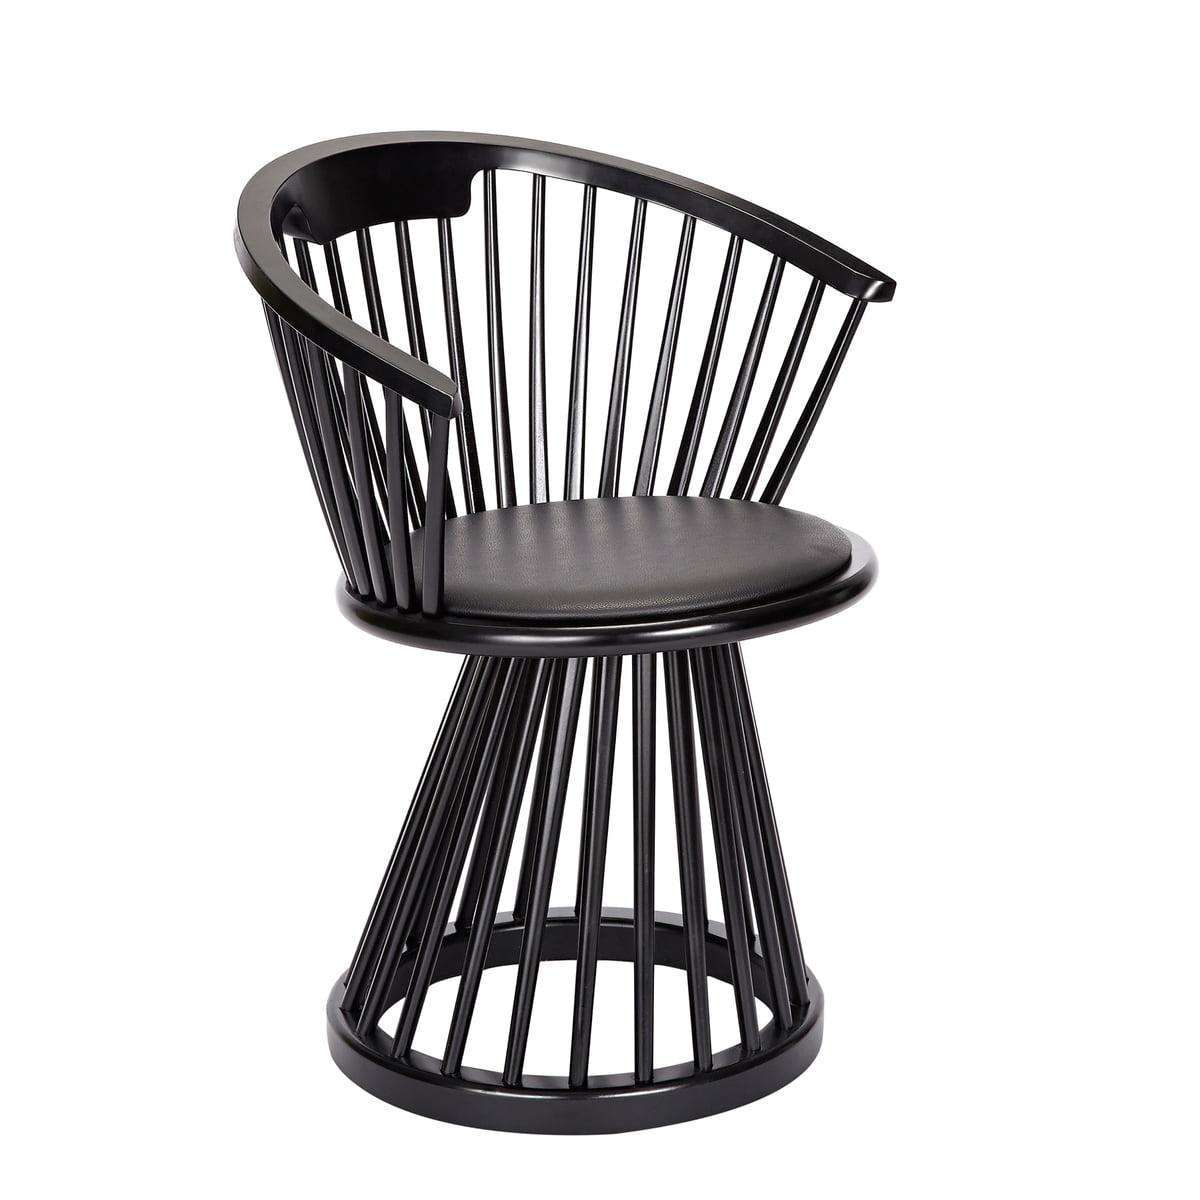 Tom Dixon - Fan Dining Chair, natural oak / black